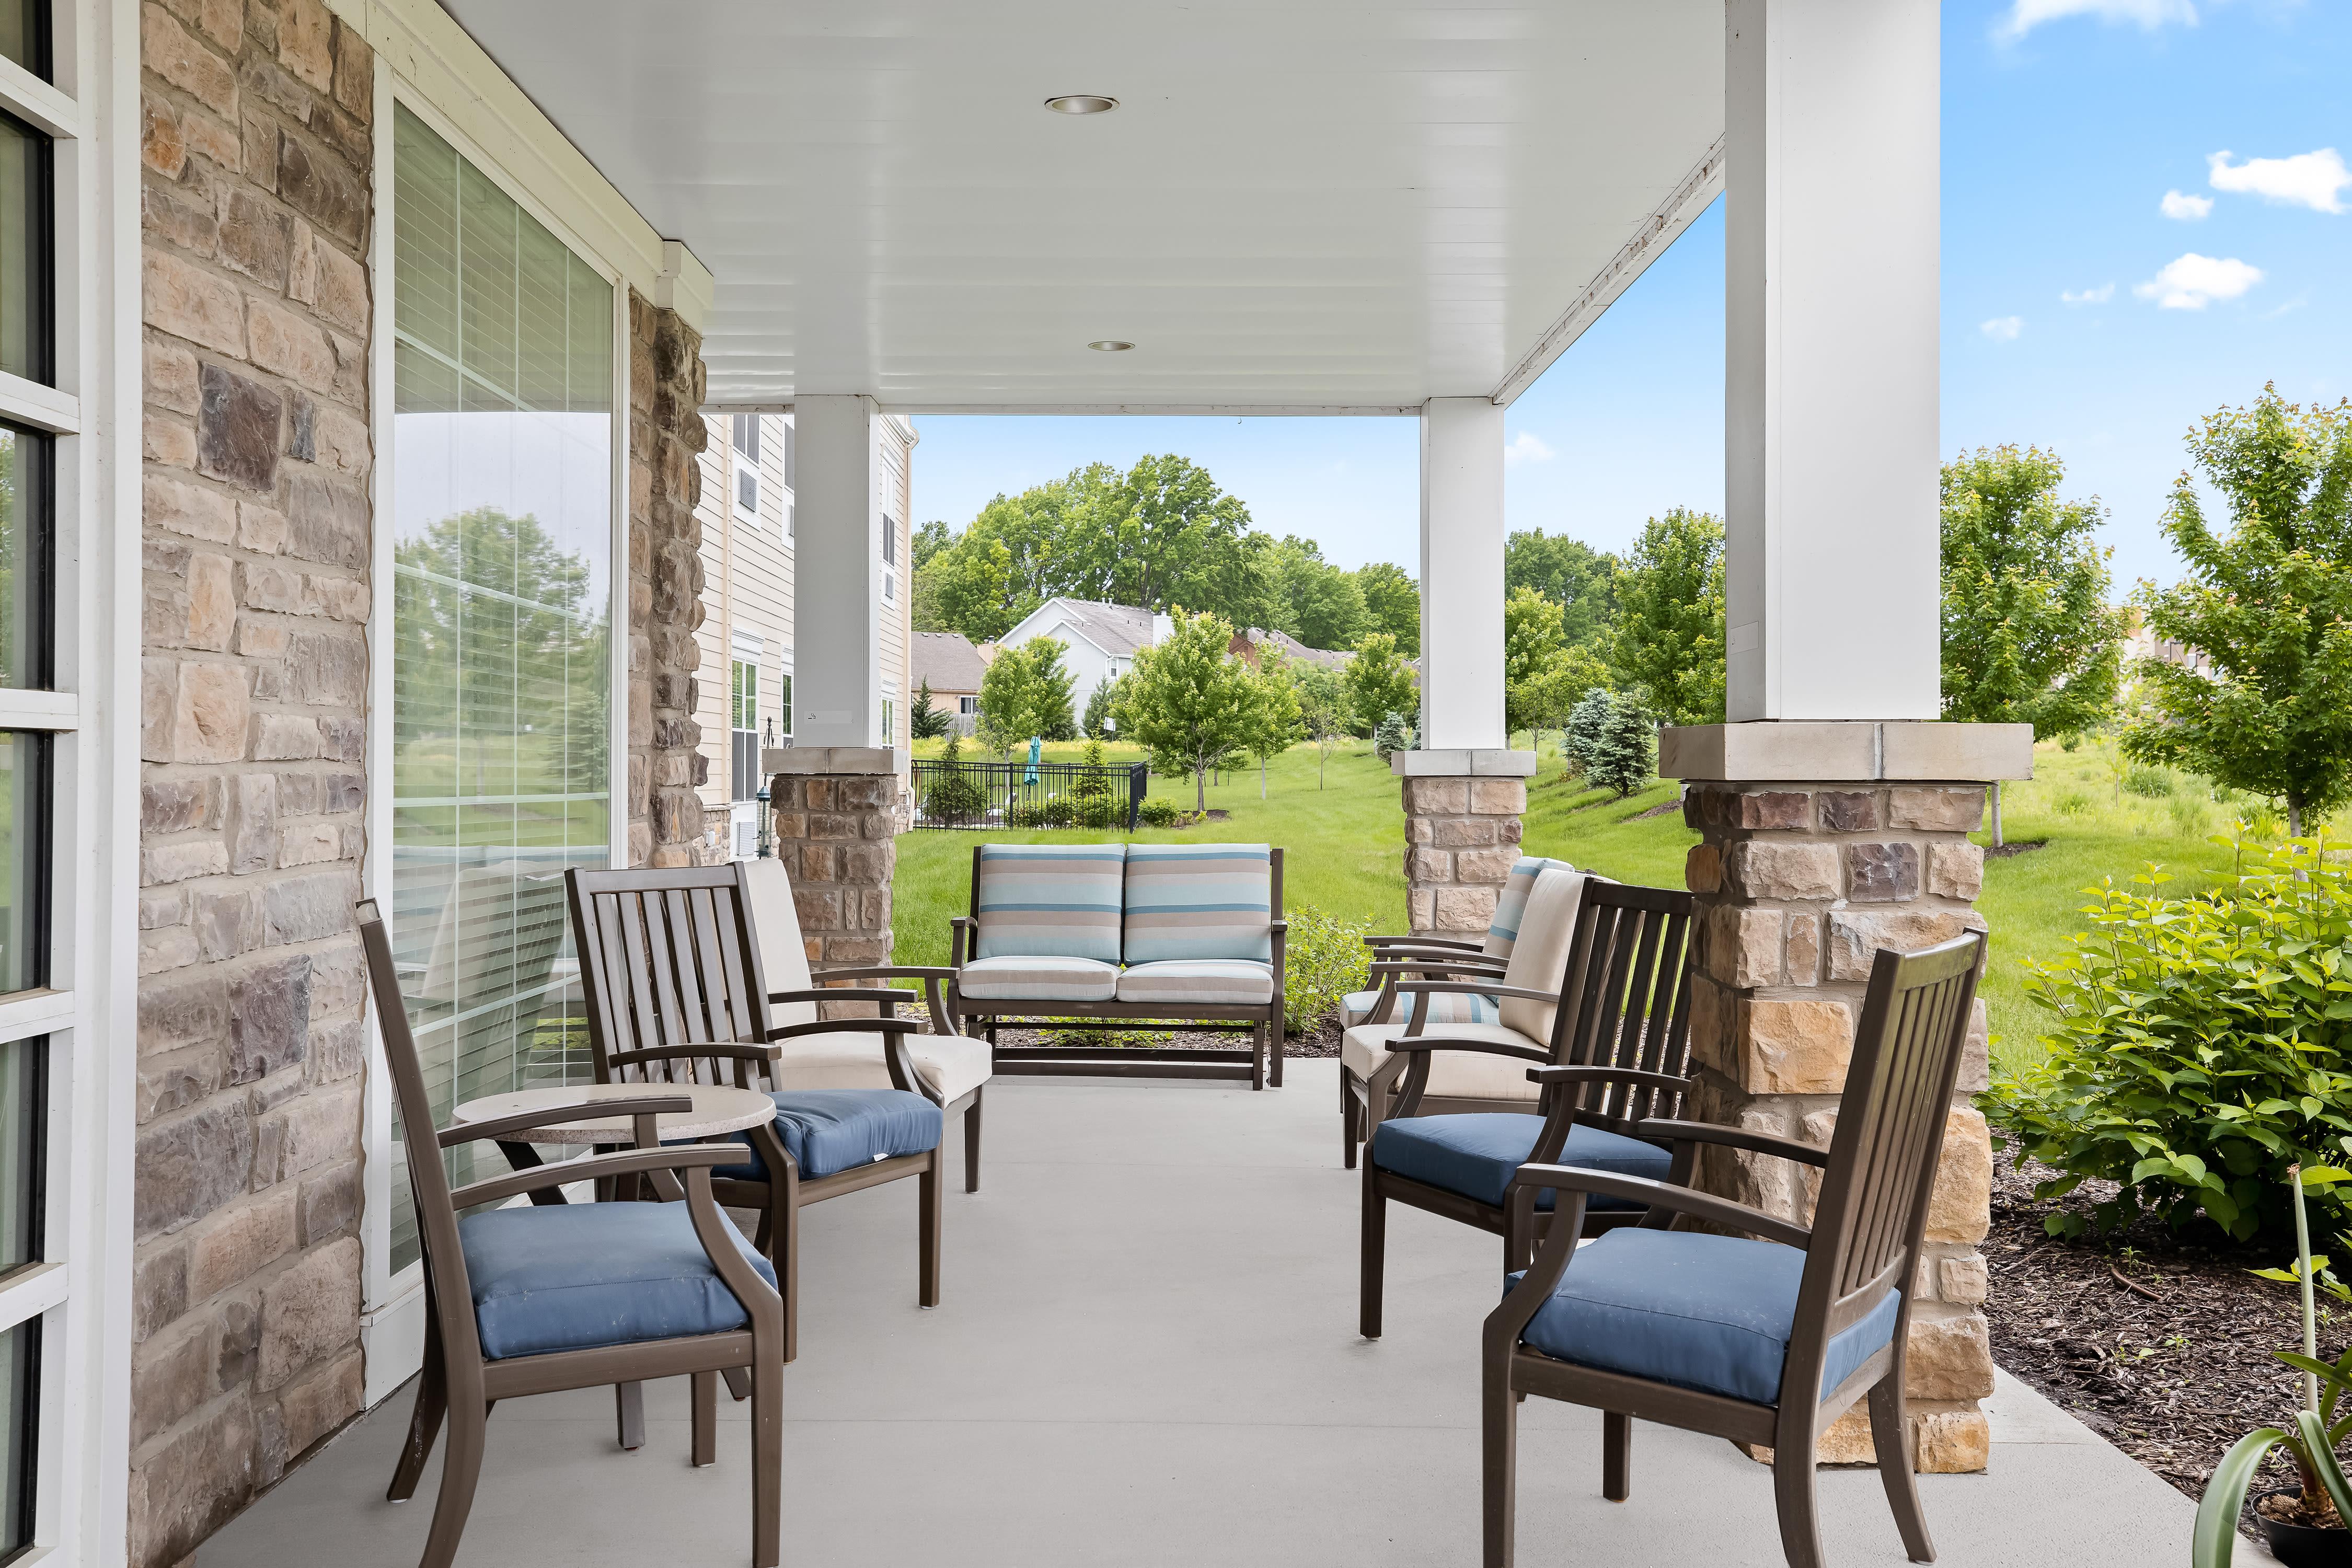 Bistro seating at Anthology of Overland Park in Overland Park, Kansas.